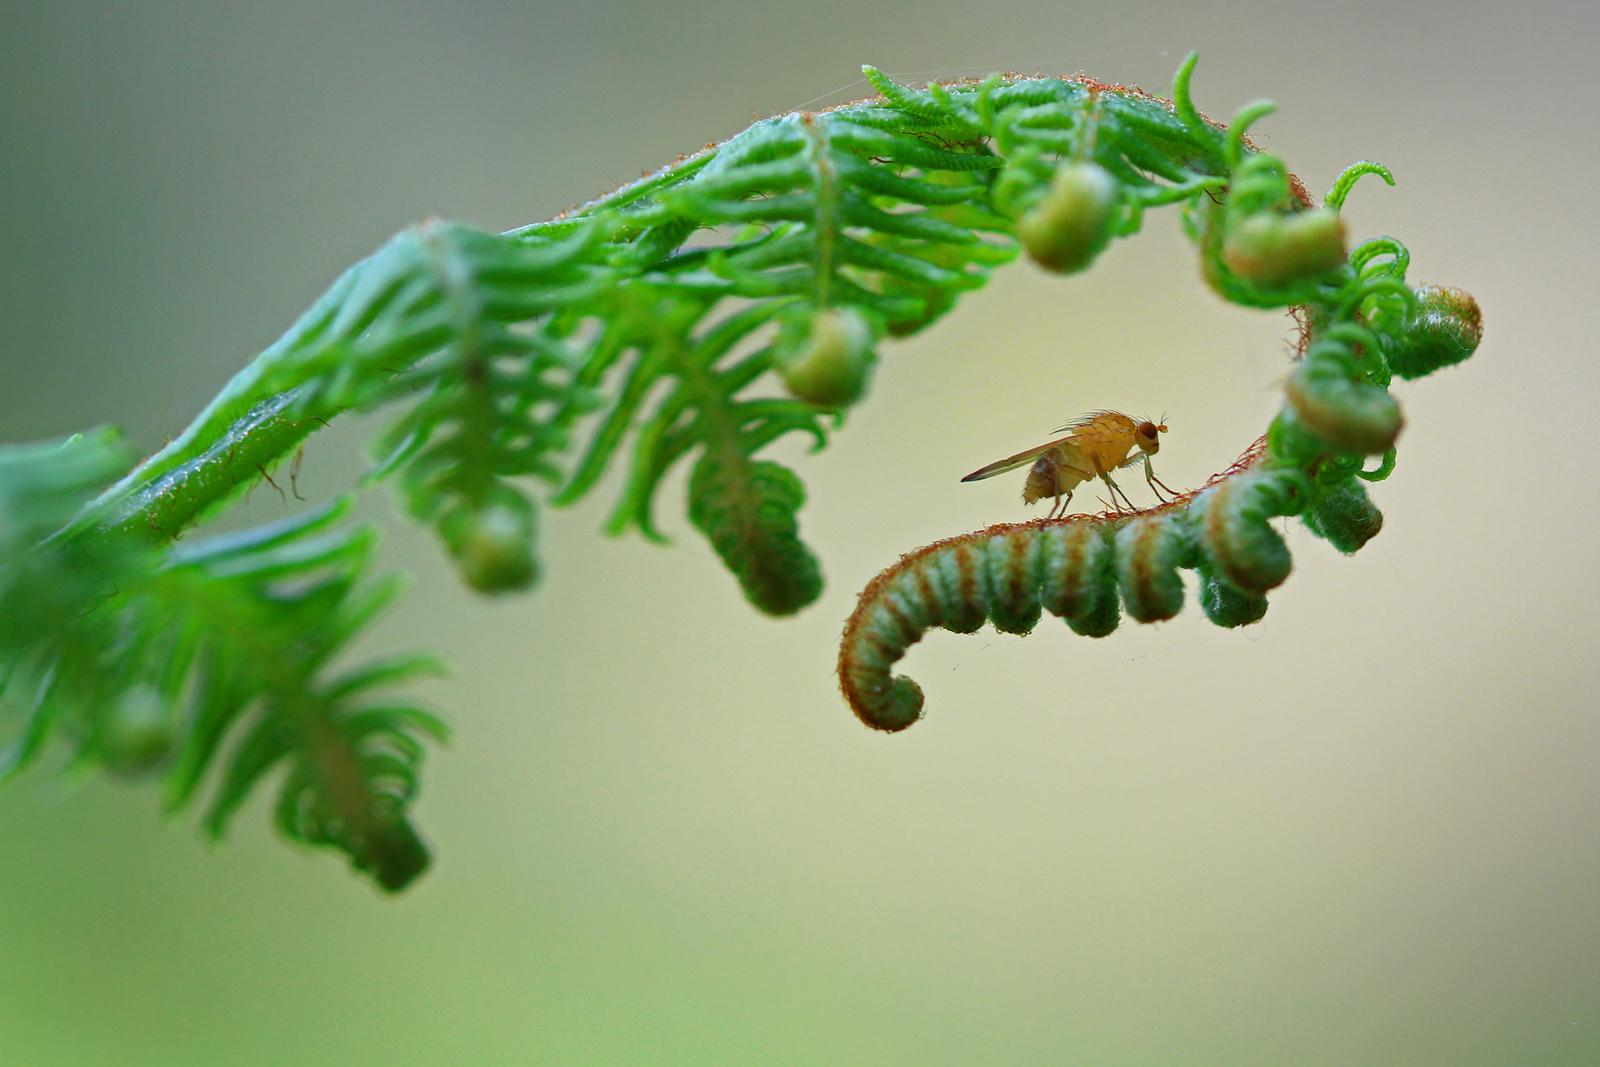 Un bello insecto - 1600x1067